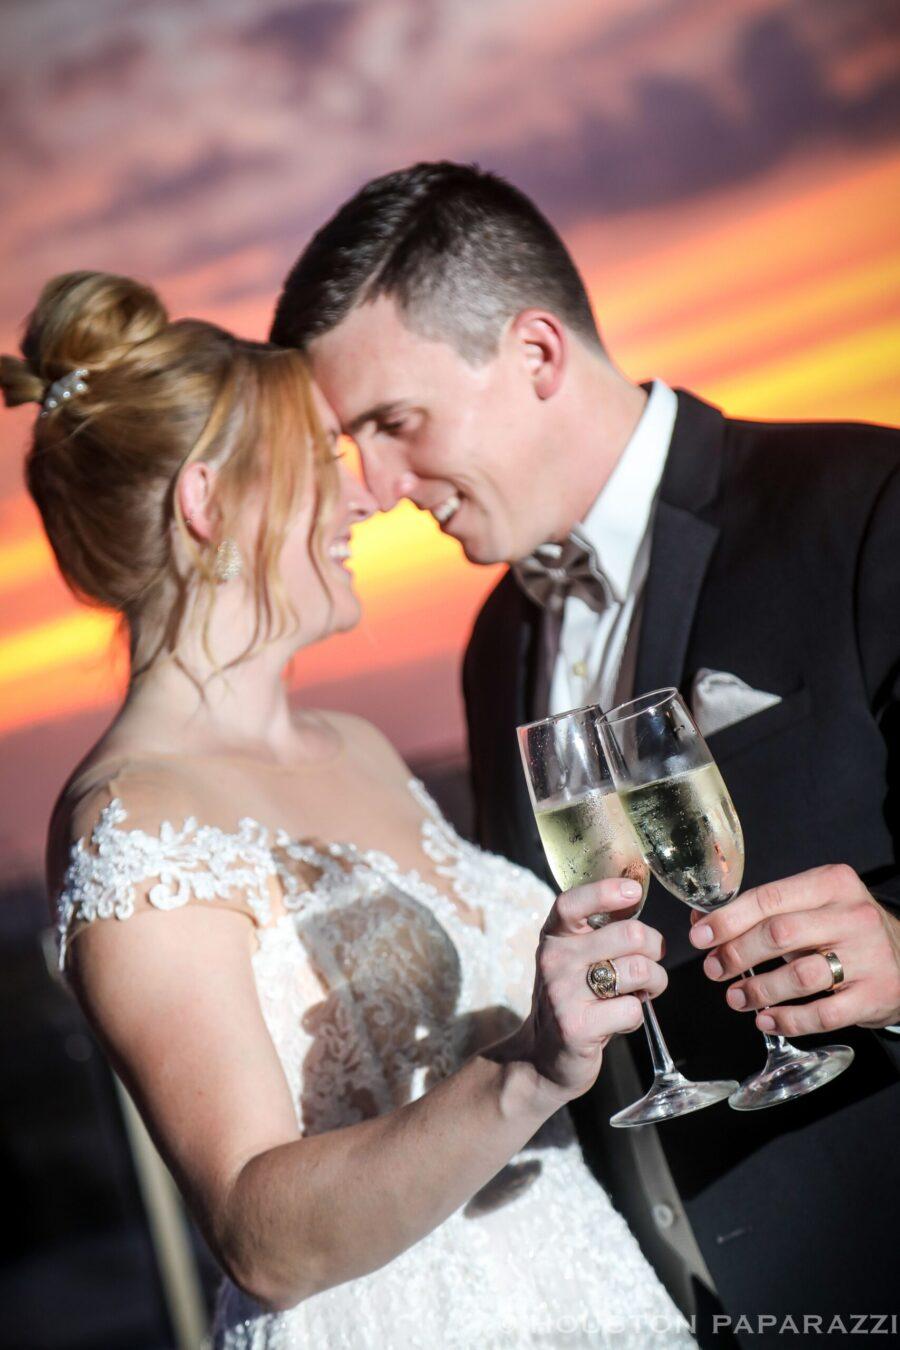 cheers to the wedding couple